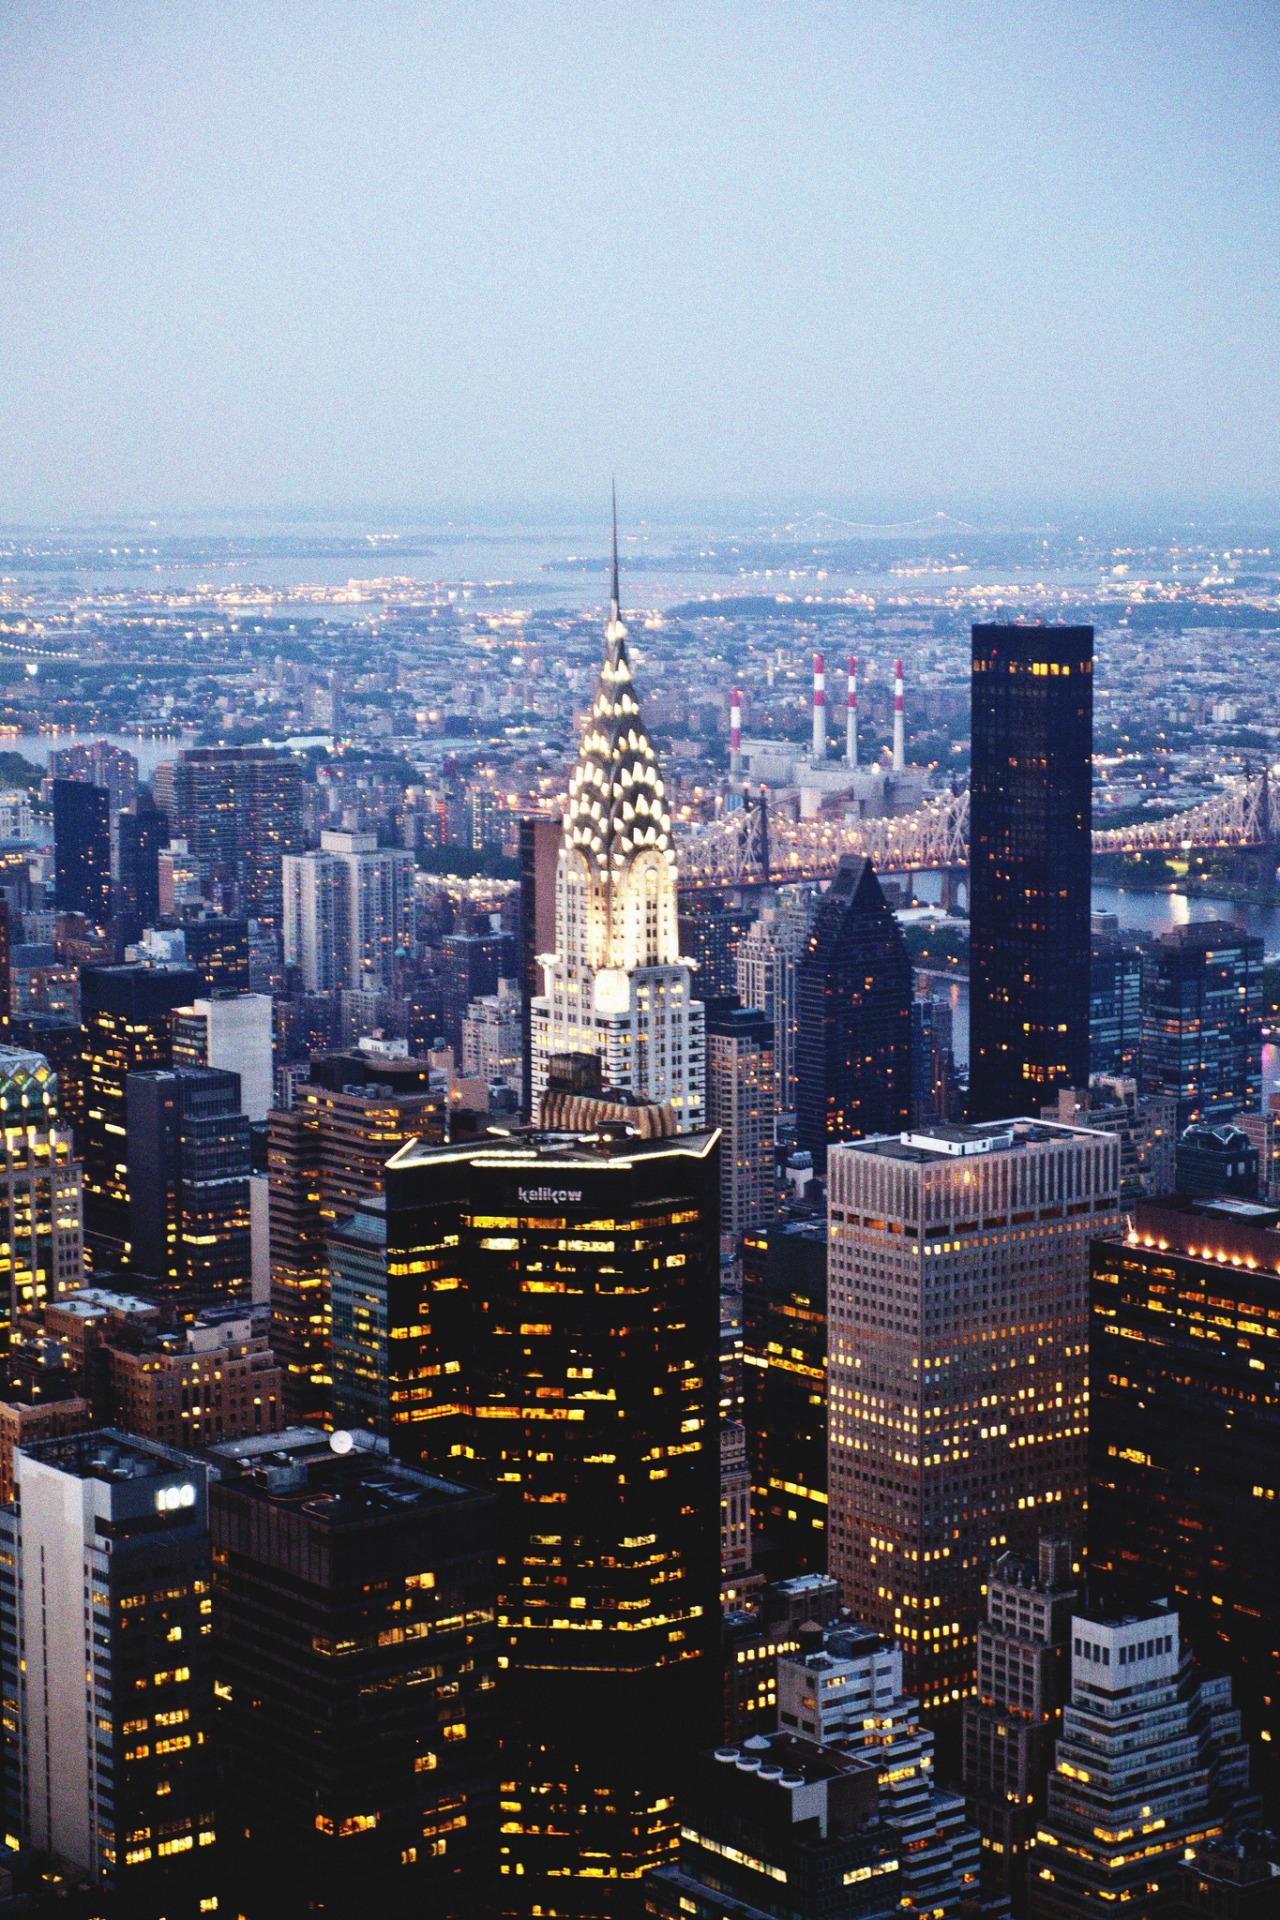 newyork lights evening skyscraper 1280x1920